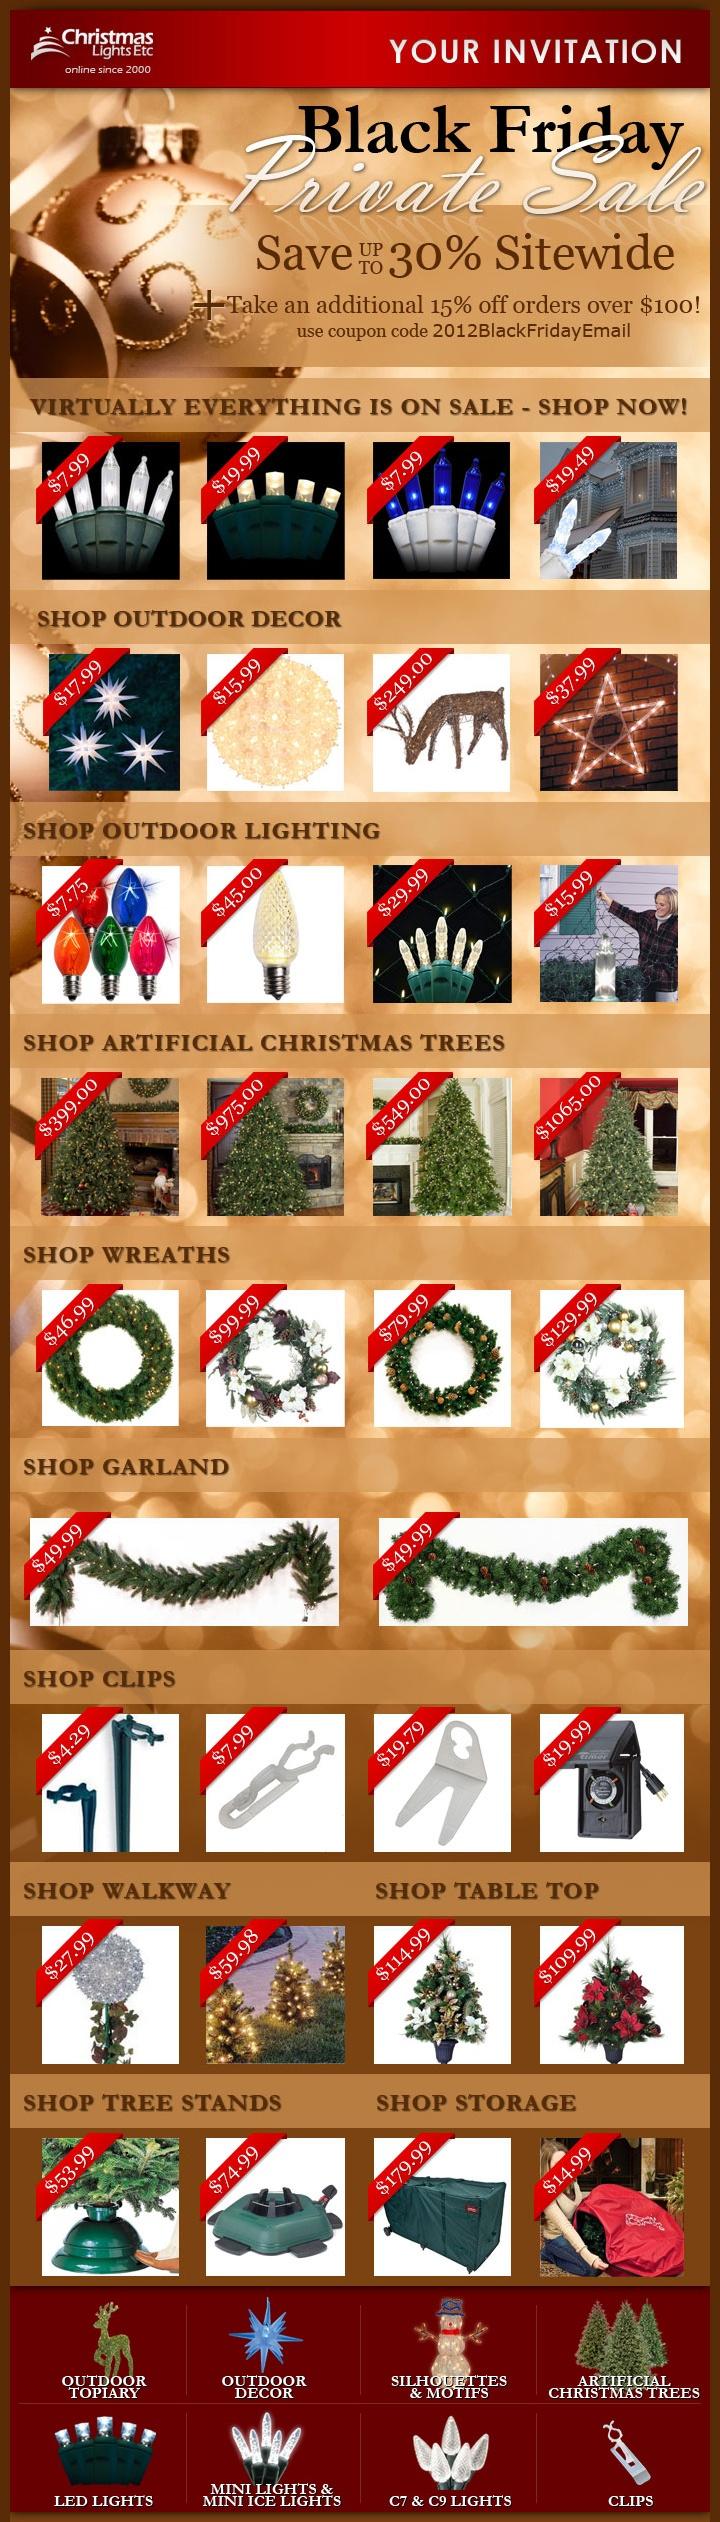 Christmas Lights Etc Email - 11/23/2012 Black Friday Sales! Join our email list for 2013 Black Friday sales alert: http://www.christmaslightsetc.com/pages/specials-signup.htm?src=pinterest